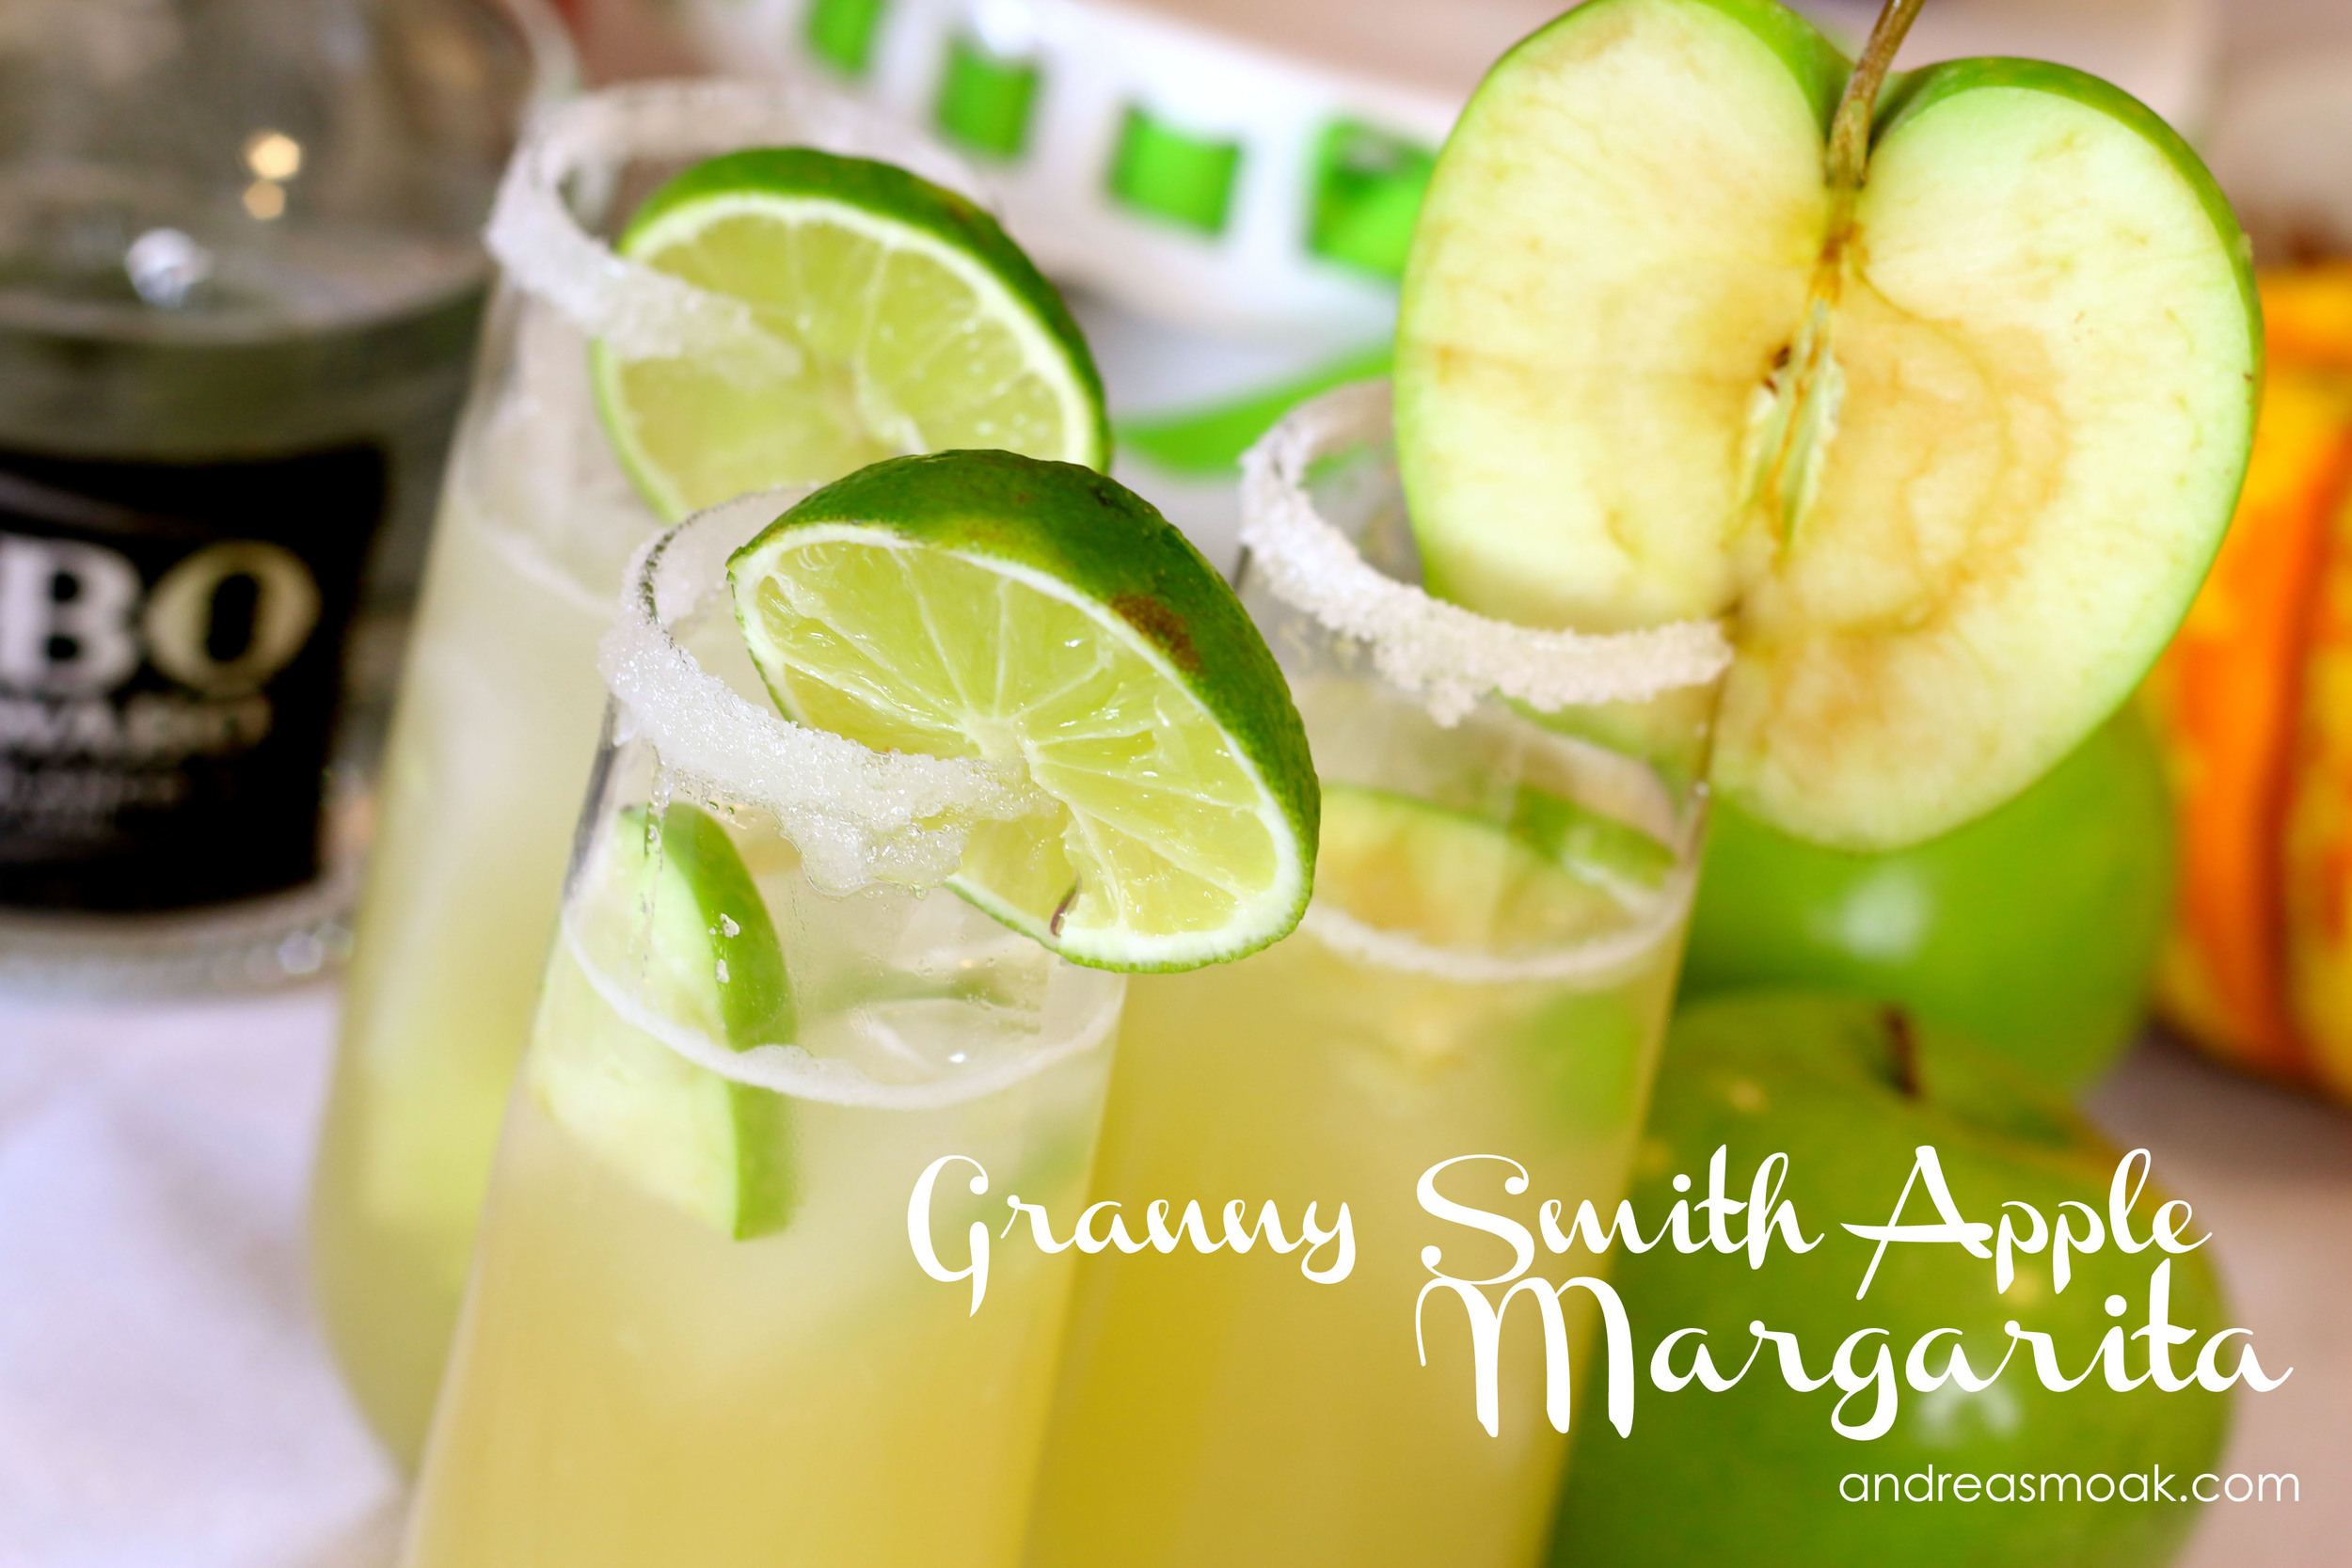 Granny Smith Apple Margarita